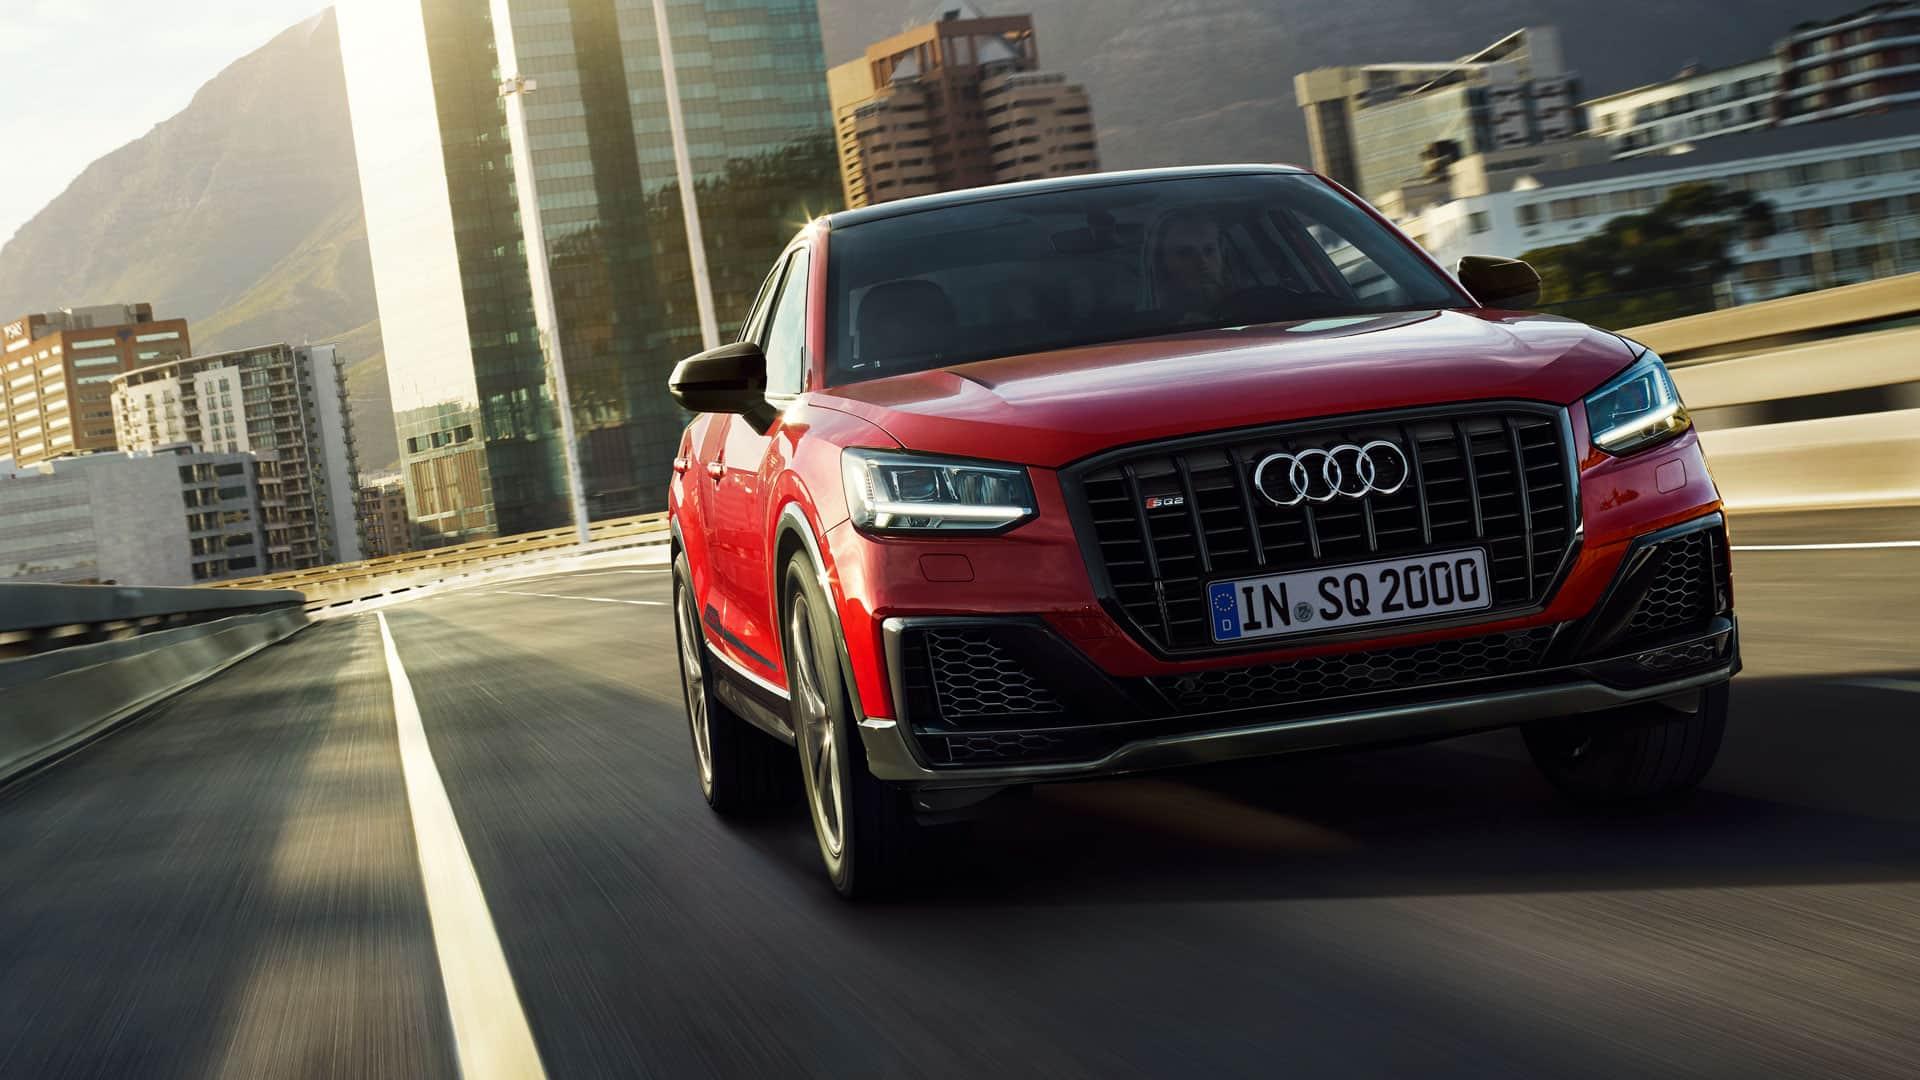 The All New Audi Sq2